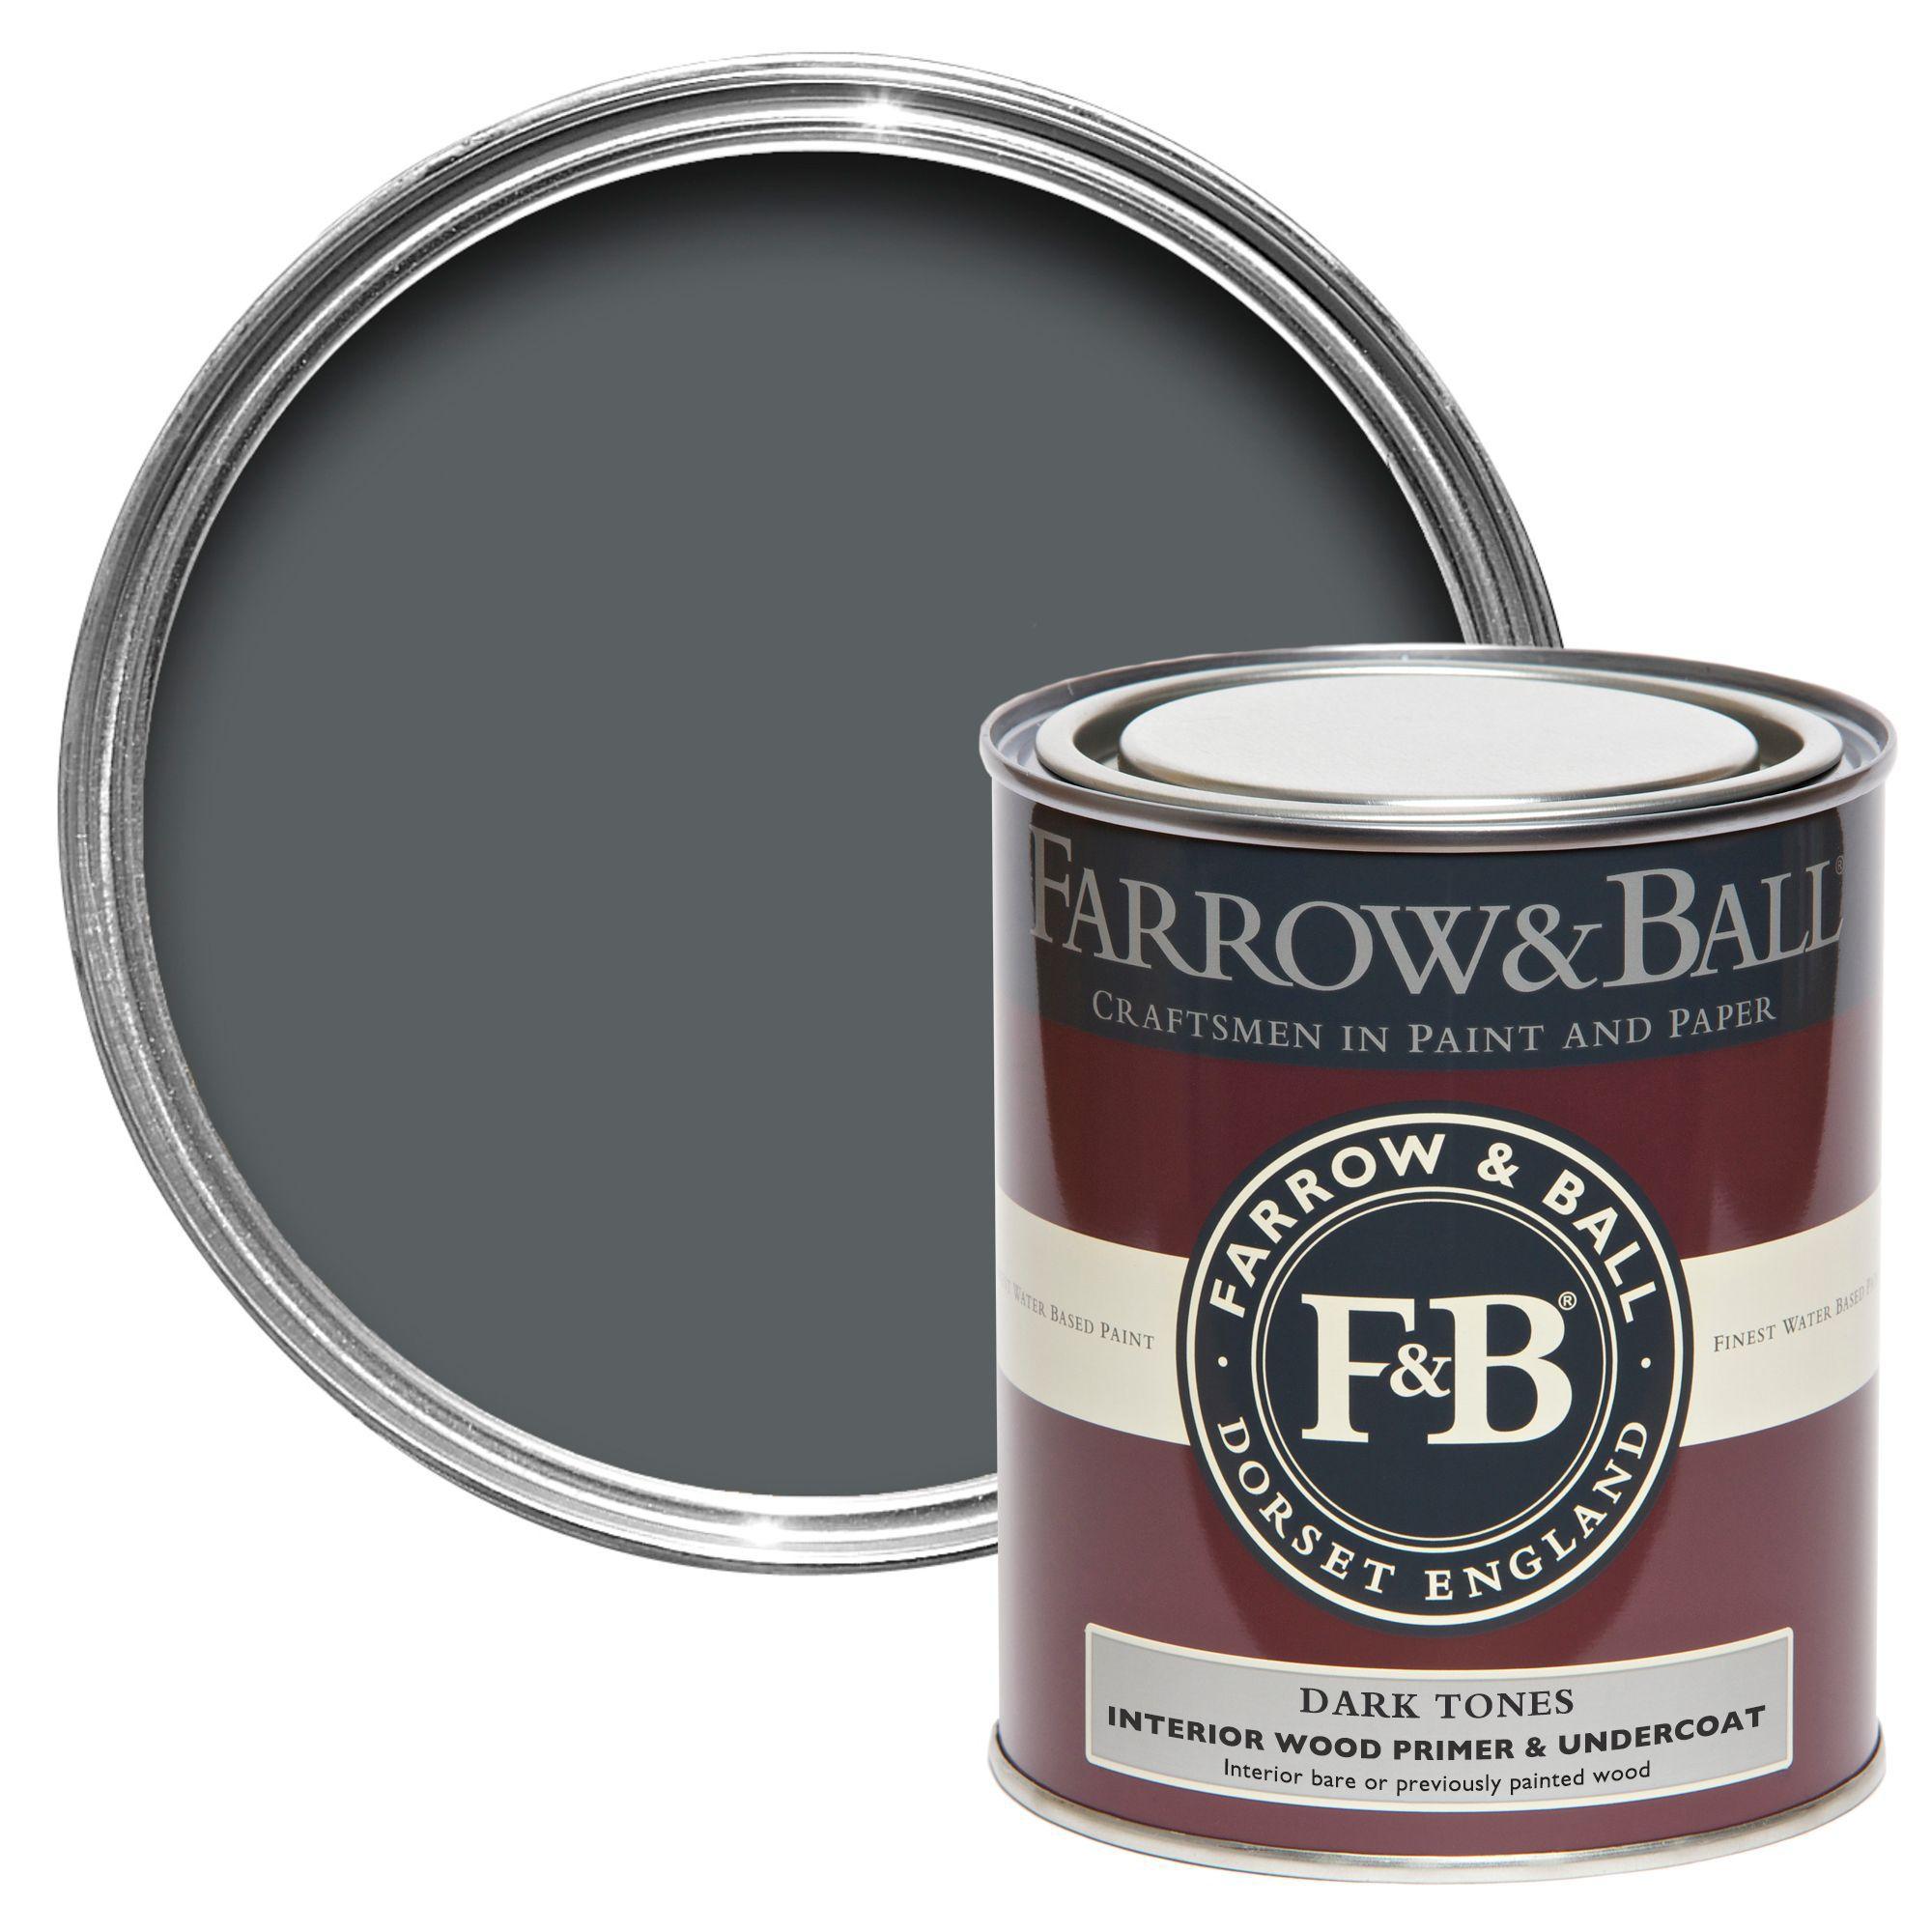 Farrow & Ball Dark Tones Wood Primer & Undercoat 750Ml